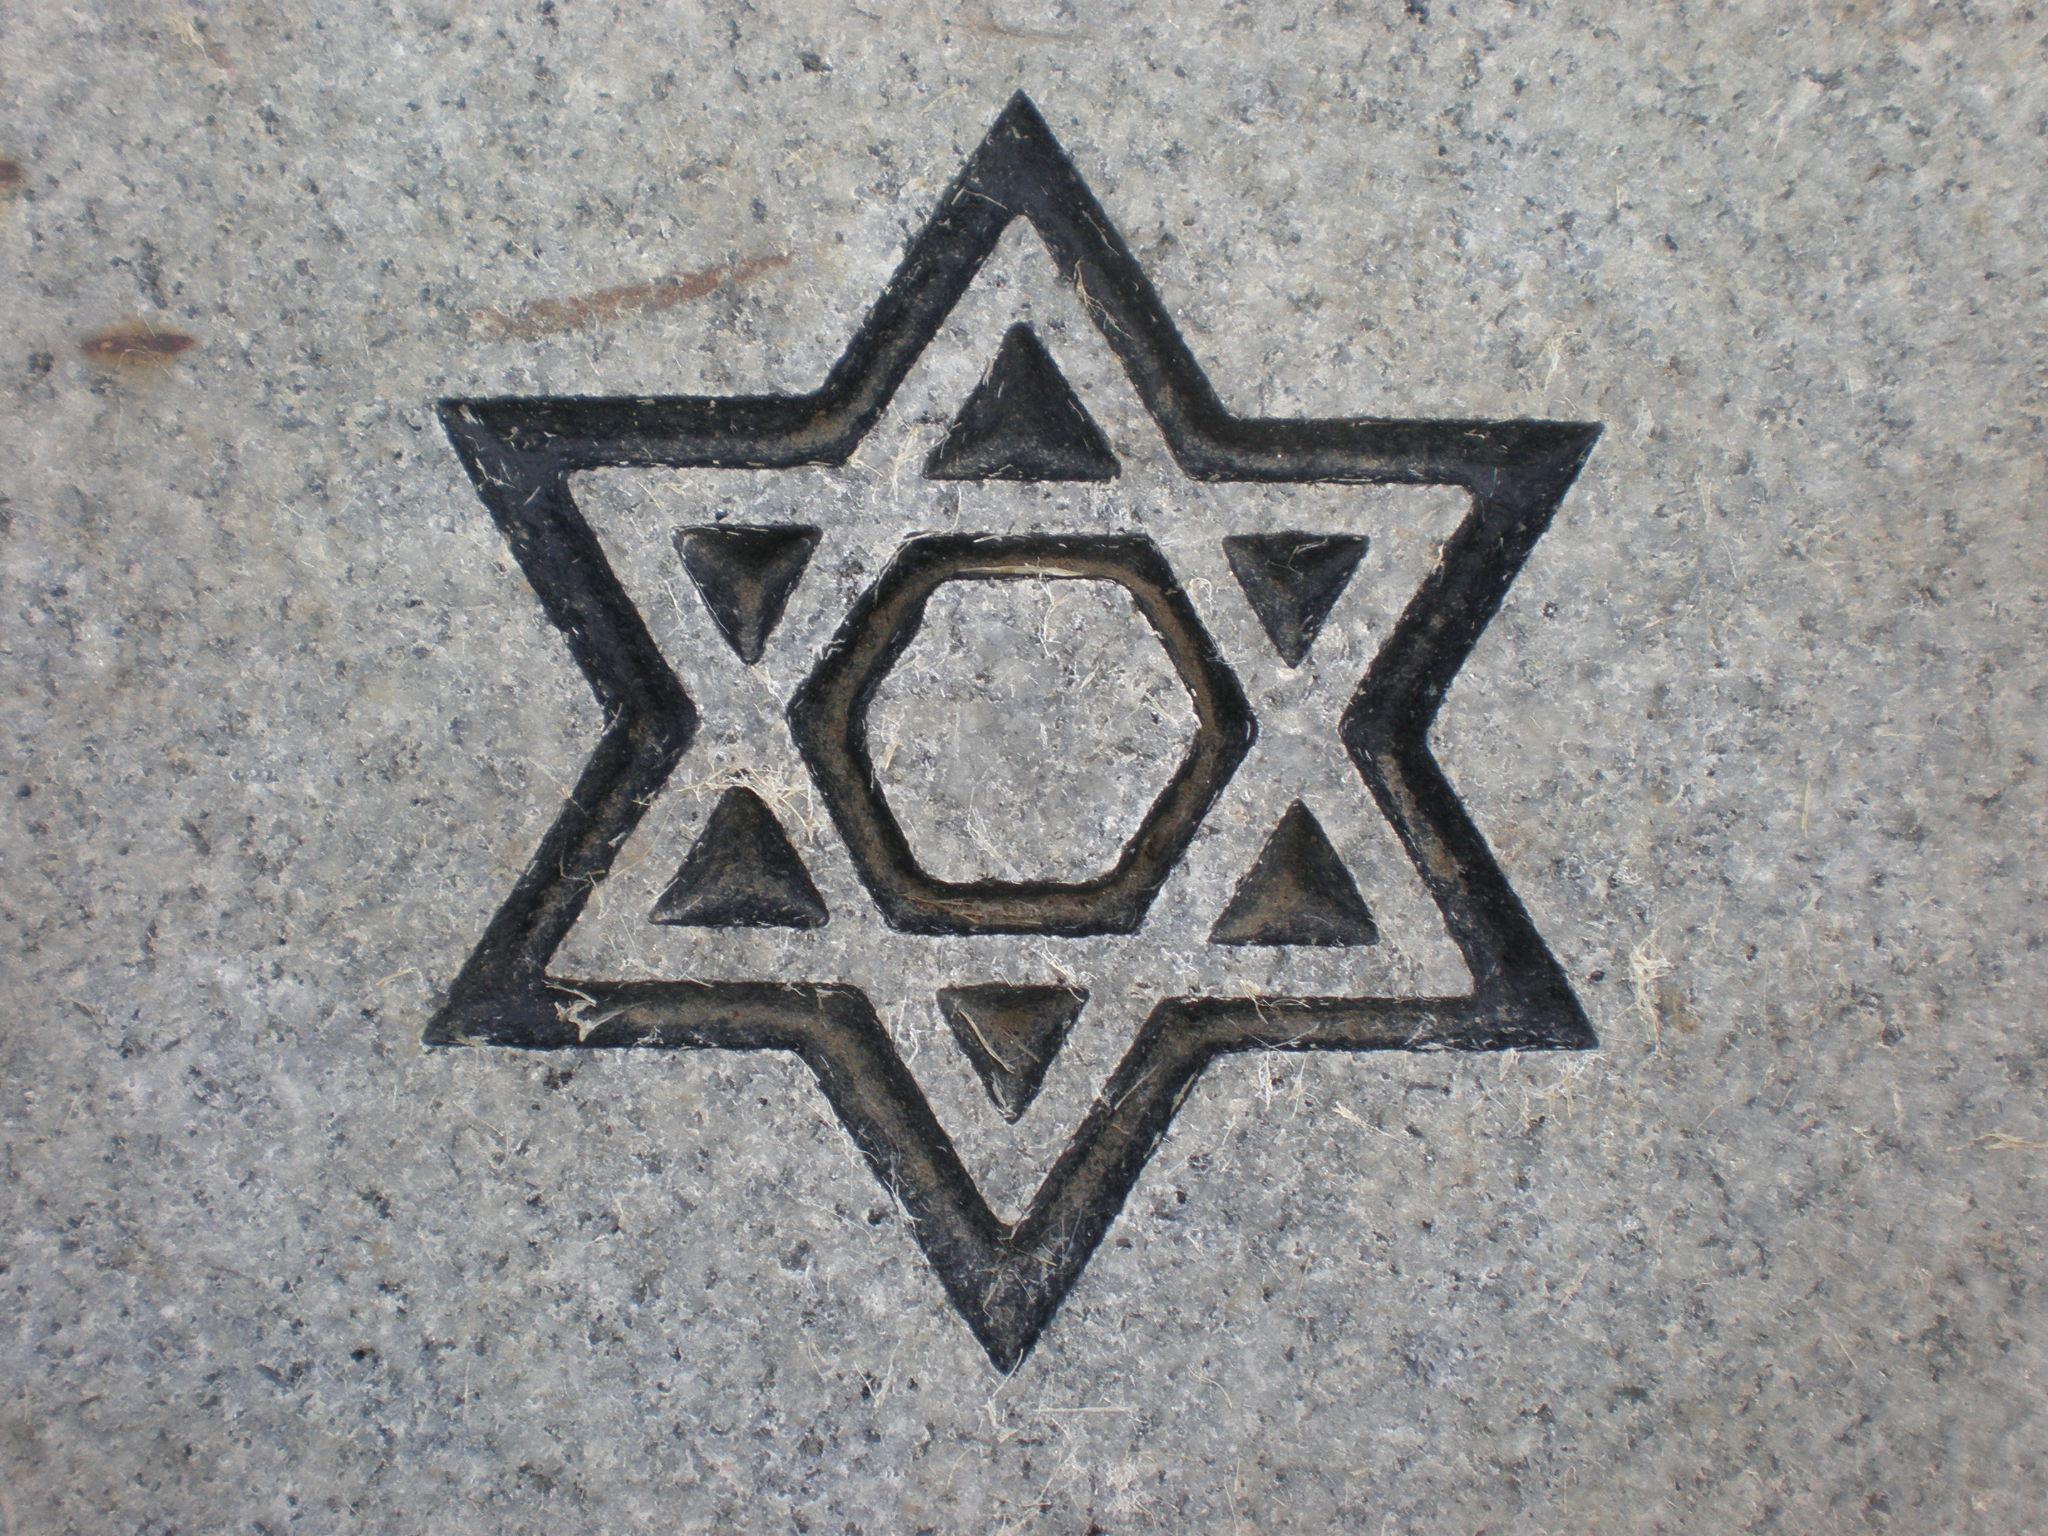 33-metodo-a-stella-di-davide Metodo a stella di Davide